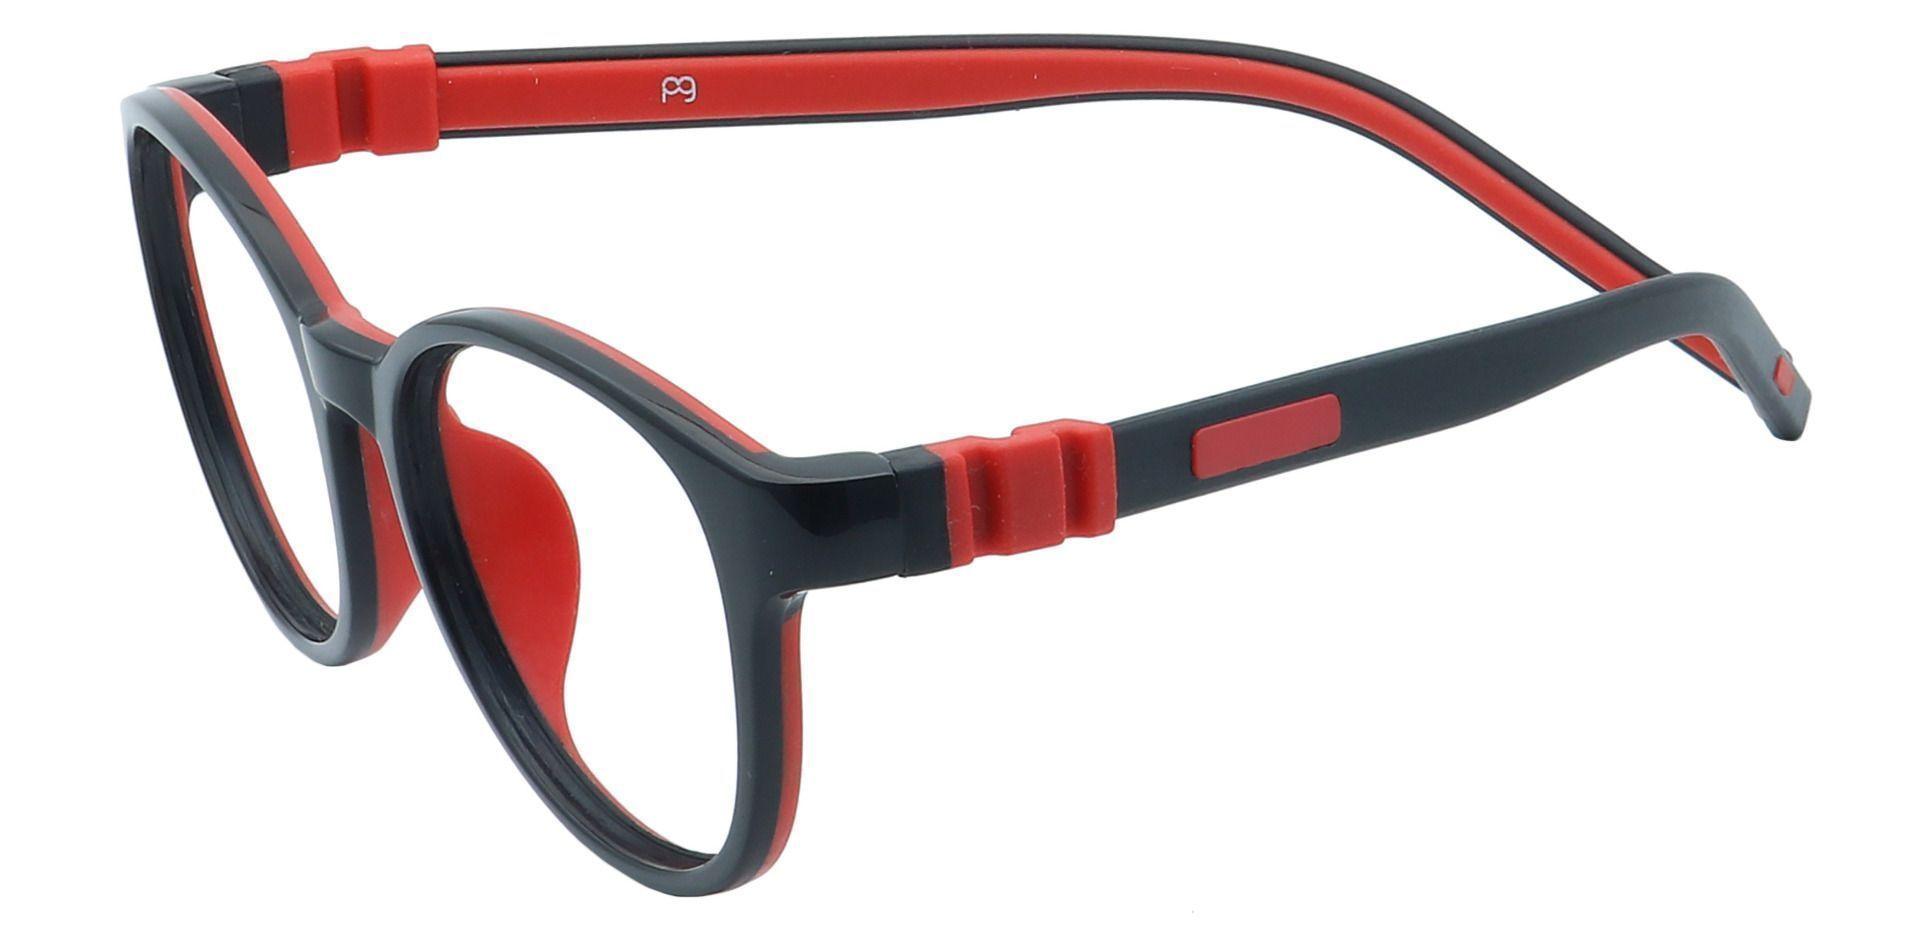 Pace Round Prescription Glasses - Red